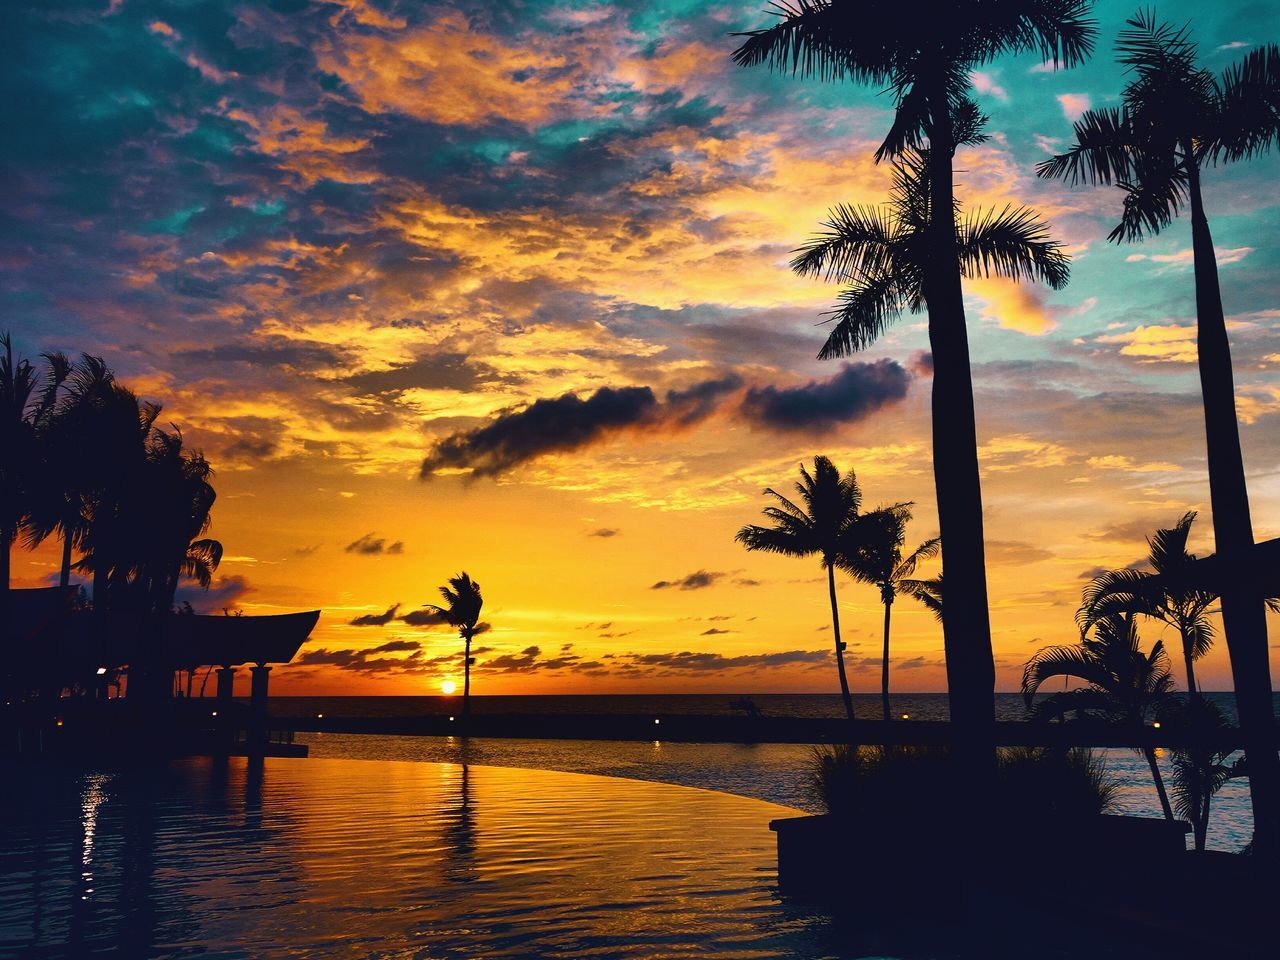 Sunset Swimming Pool Beach Coconut Trees Nature Natural Beauty Colors The Empire Hotel & Country Golf Brunei Brunei Brunei Darussalam Bandar Seri Begawan Traveling Palm Tree Sky Sea